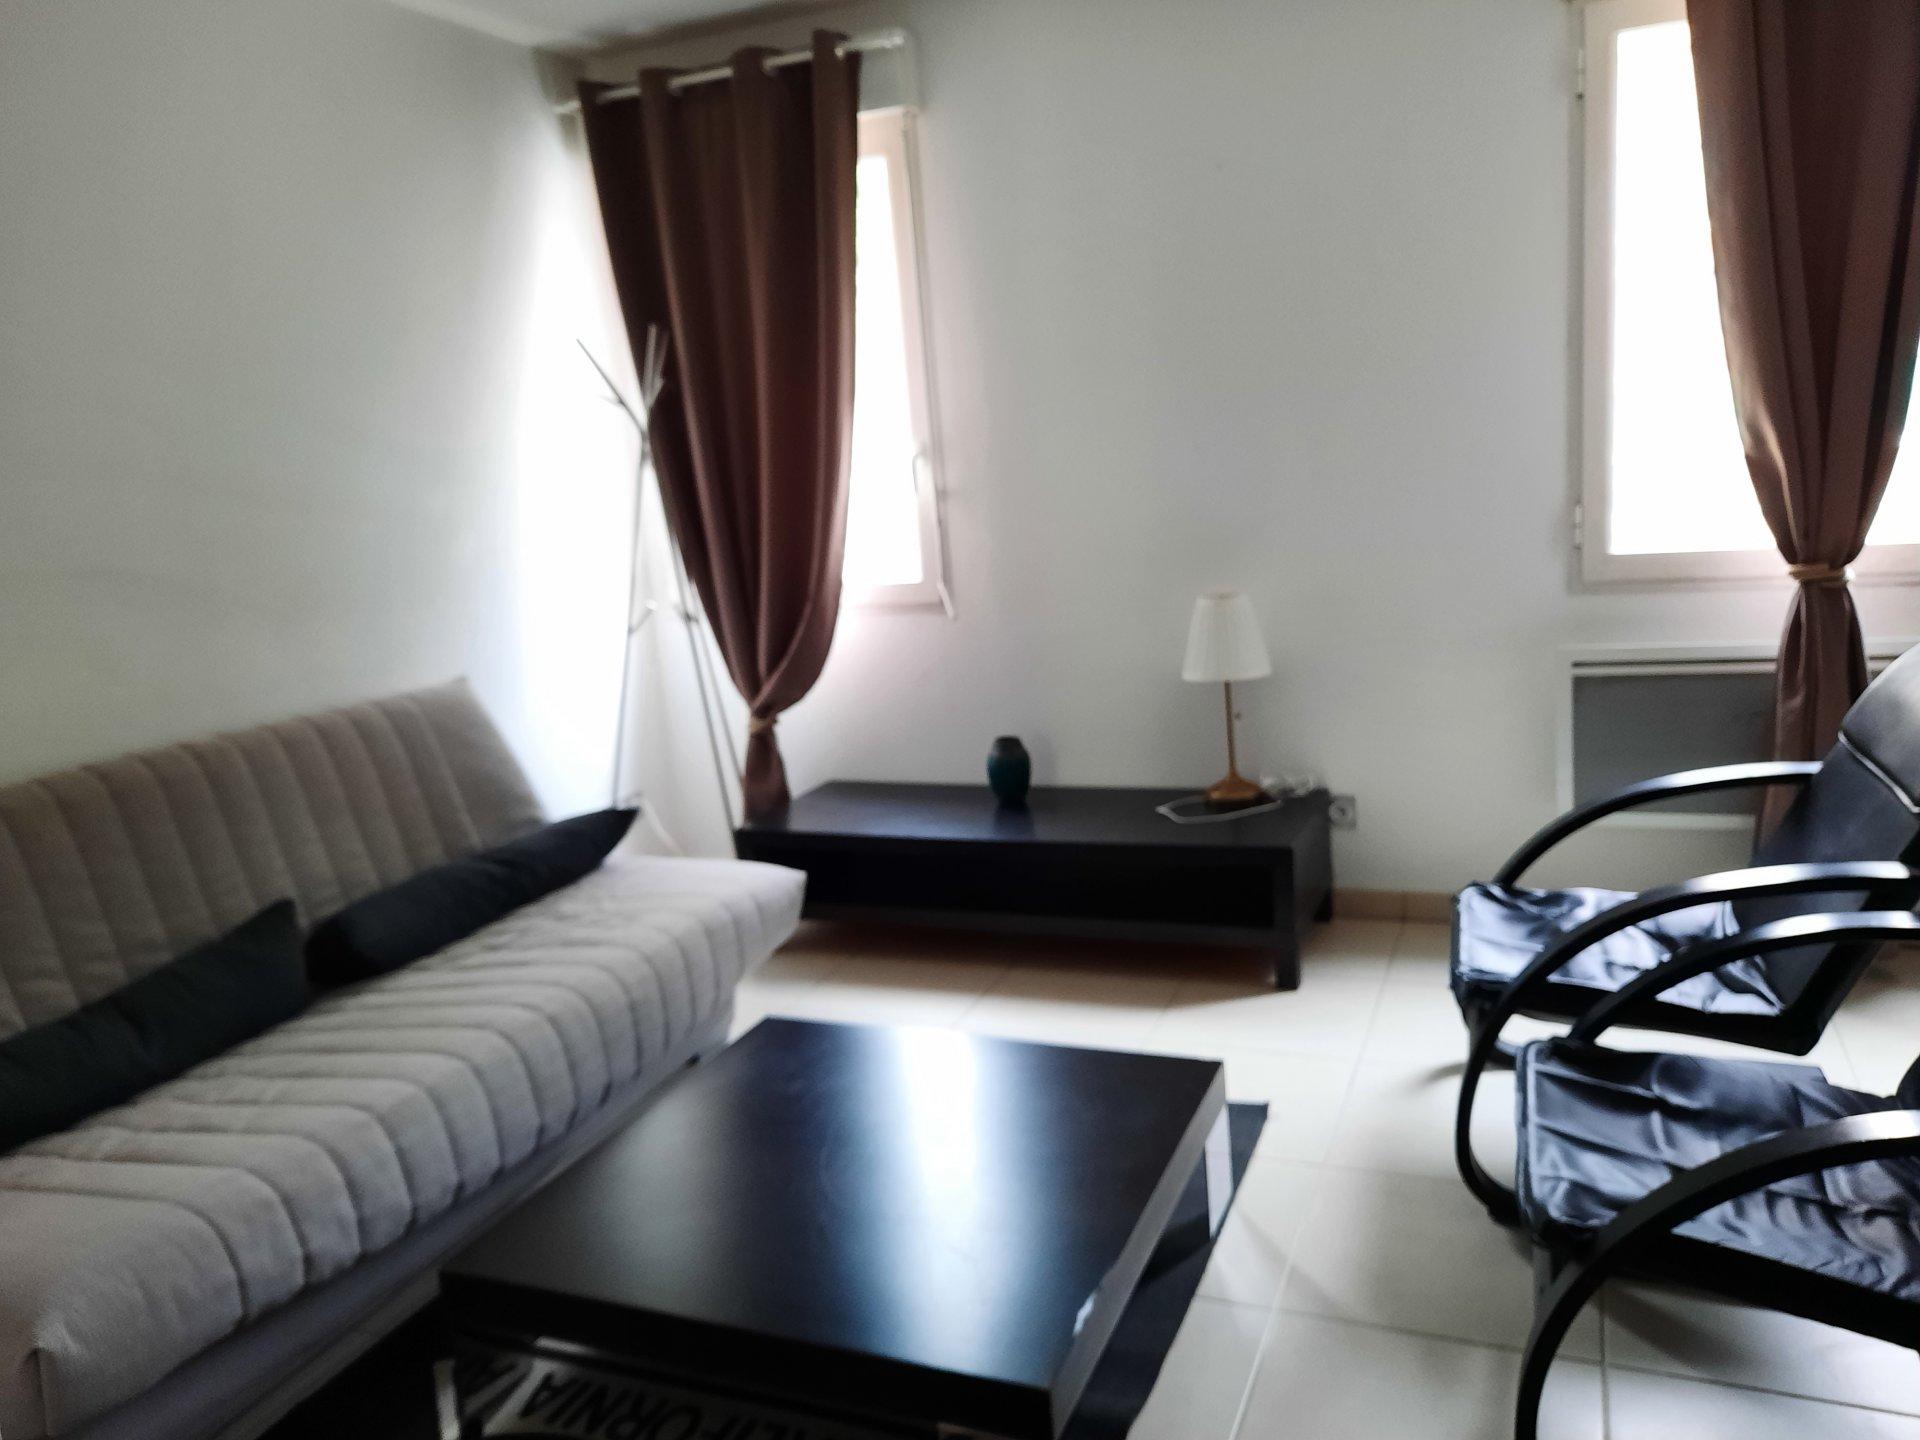 Location Appartement - Aix-en-Provence